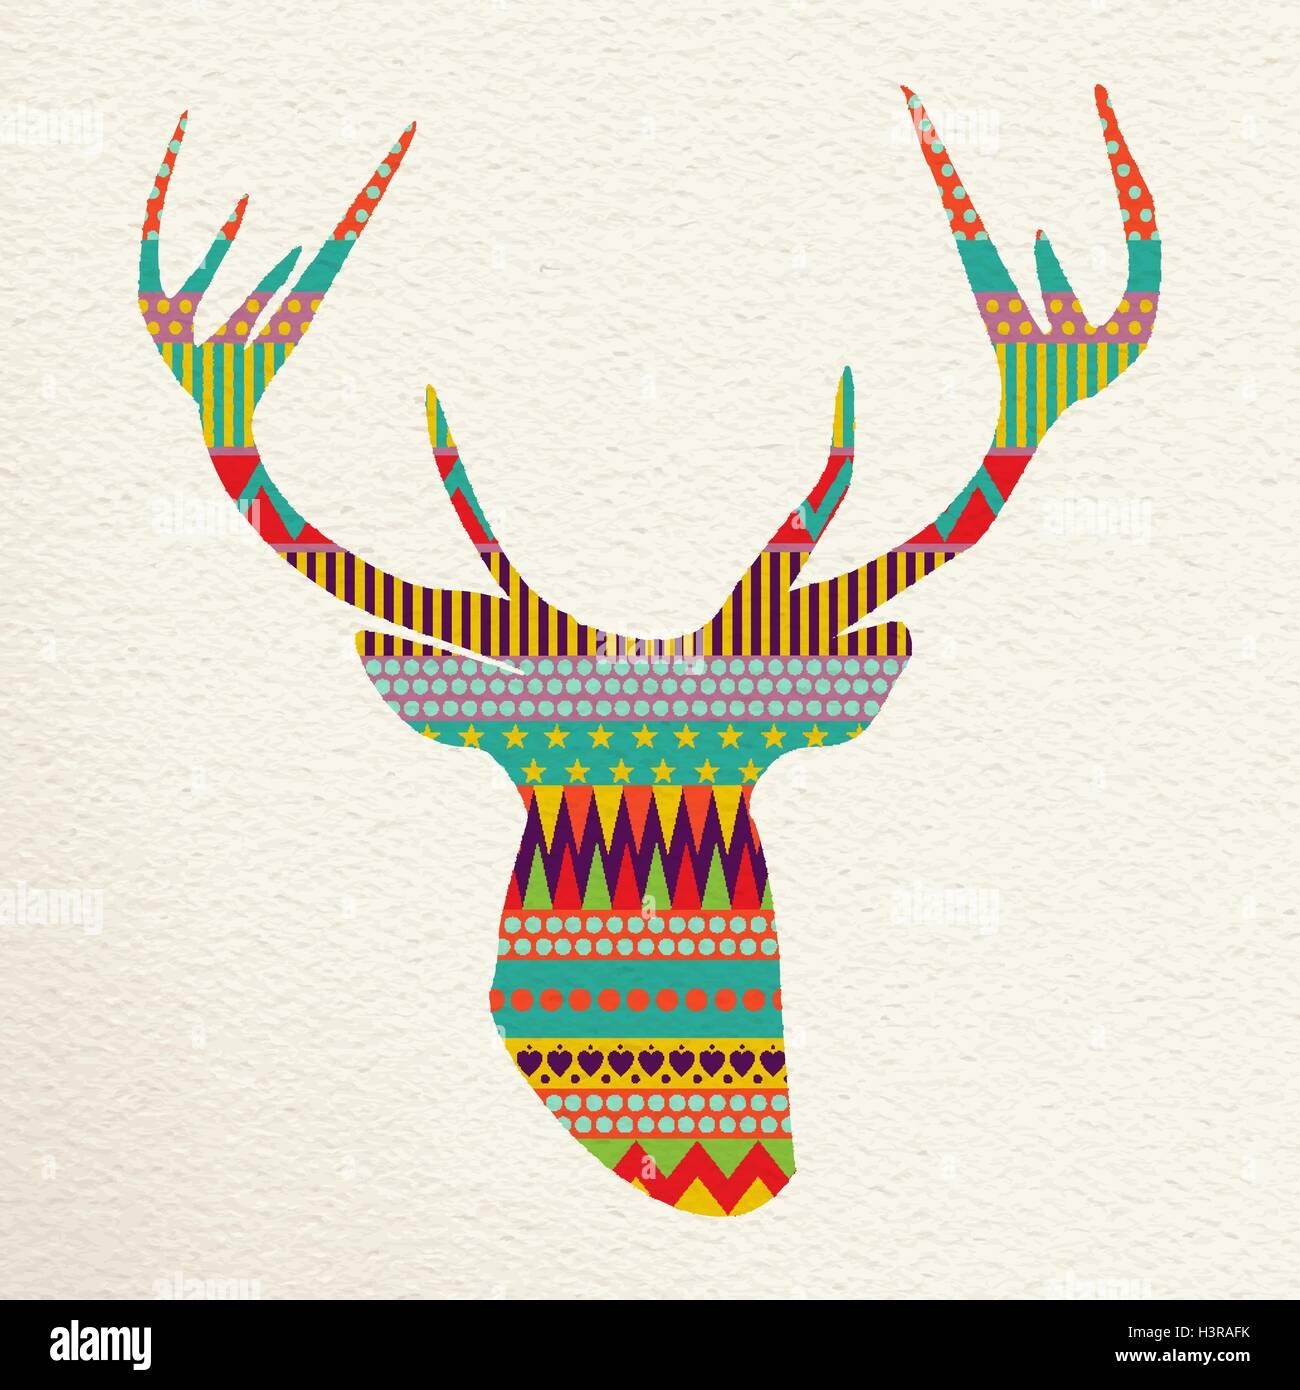 Merry Christmas reindeer head design in fun happy colors with indie ...